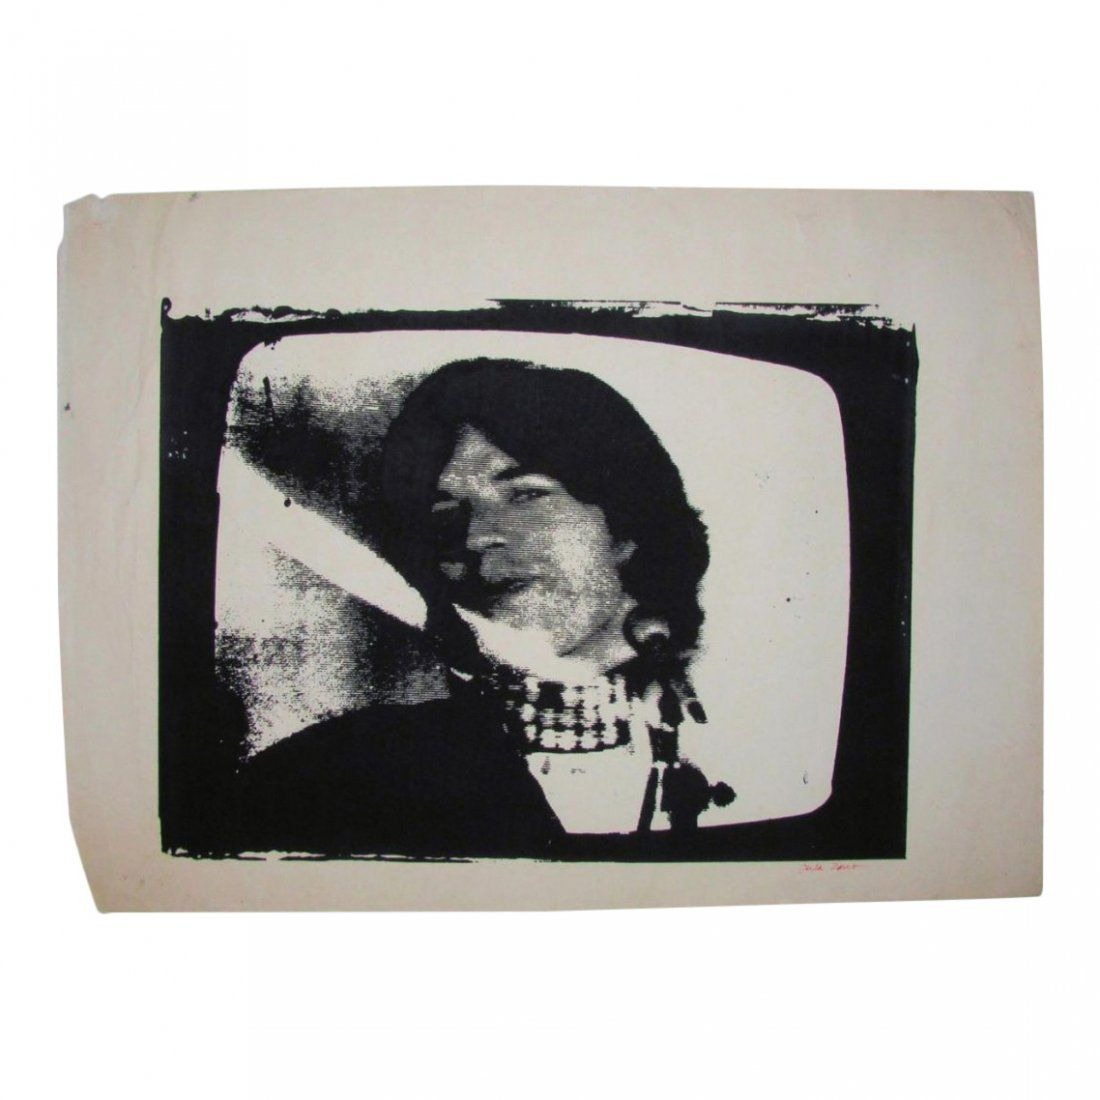 Vintage Screen Print Poster of Mick Jagger, 1980